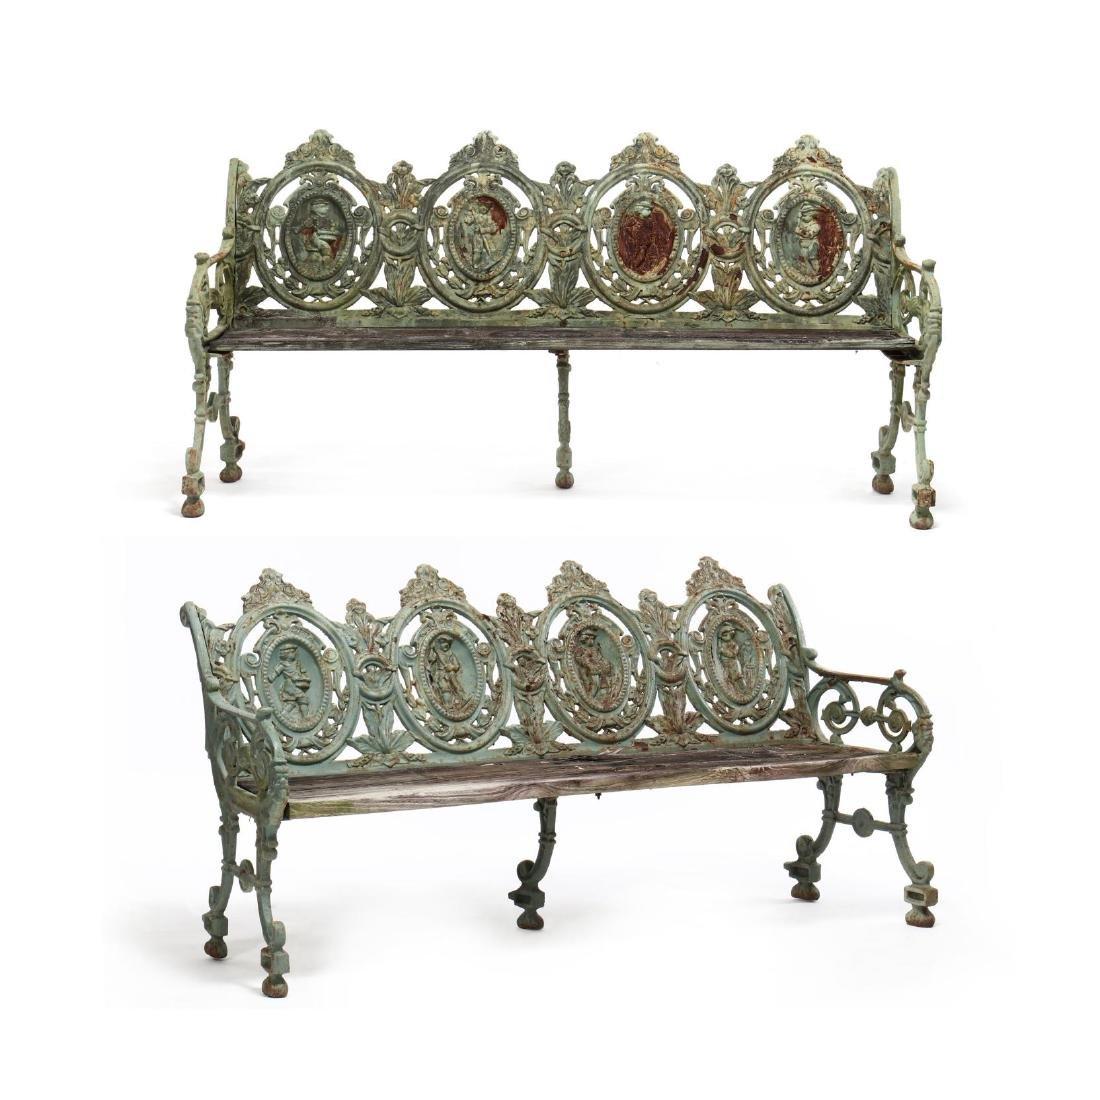 Pair of Renaissance Revival Cast Iron Garden Benches